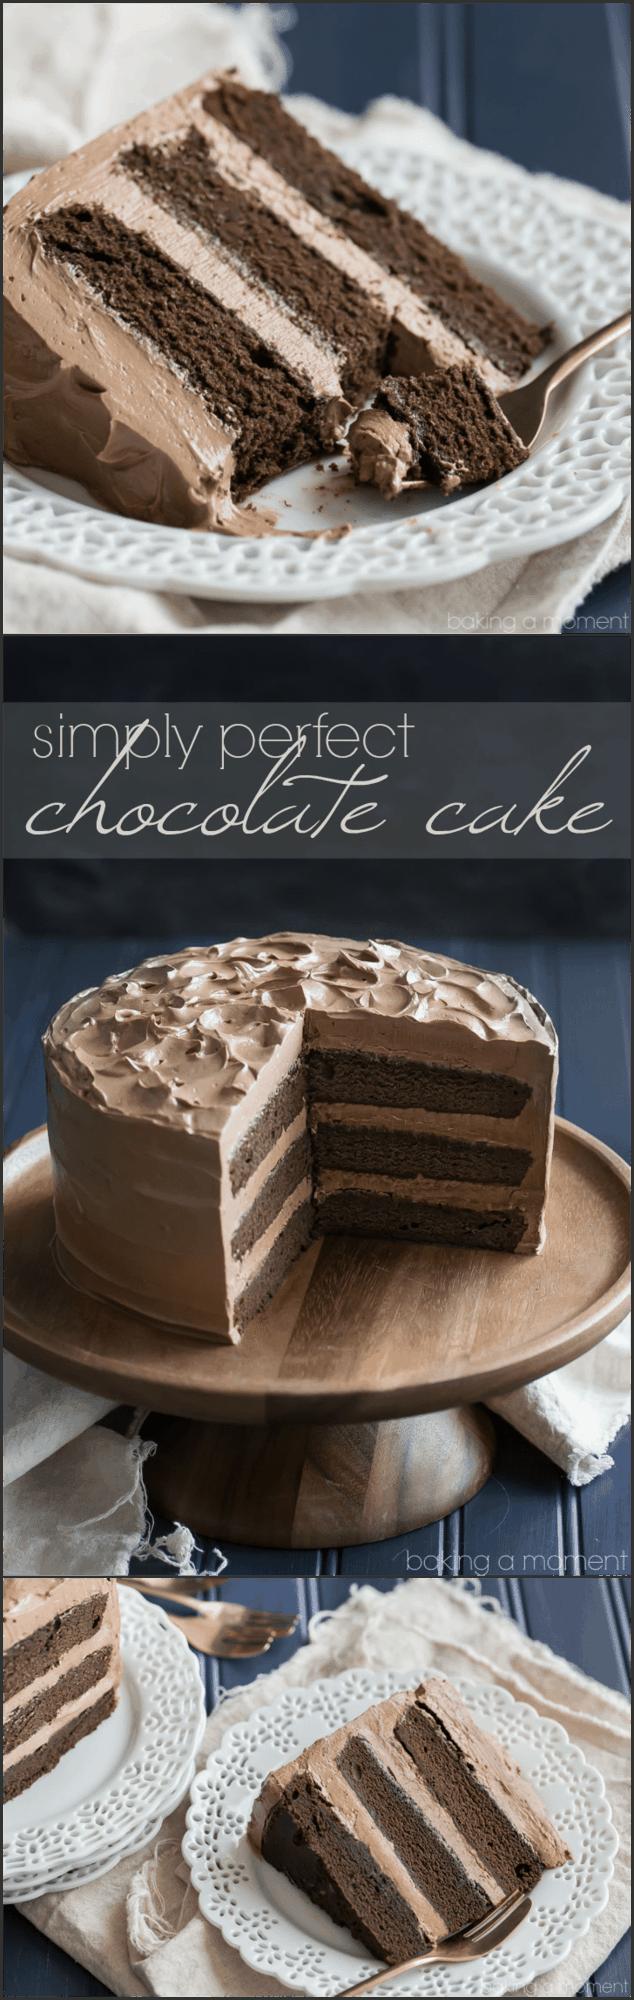 Natalie moist chocolate cake